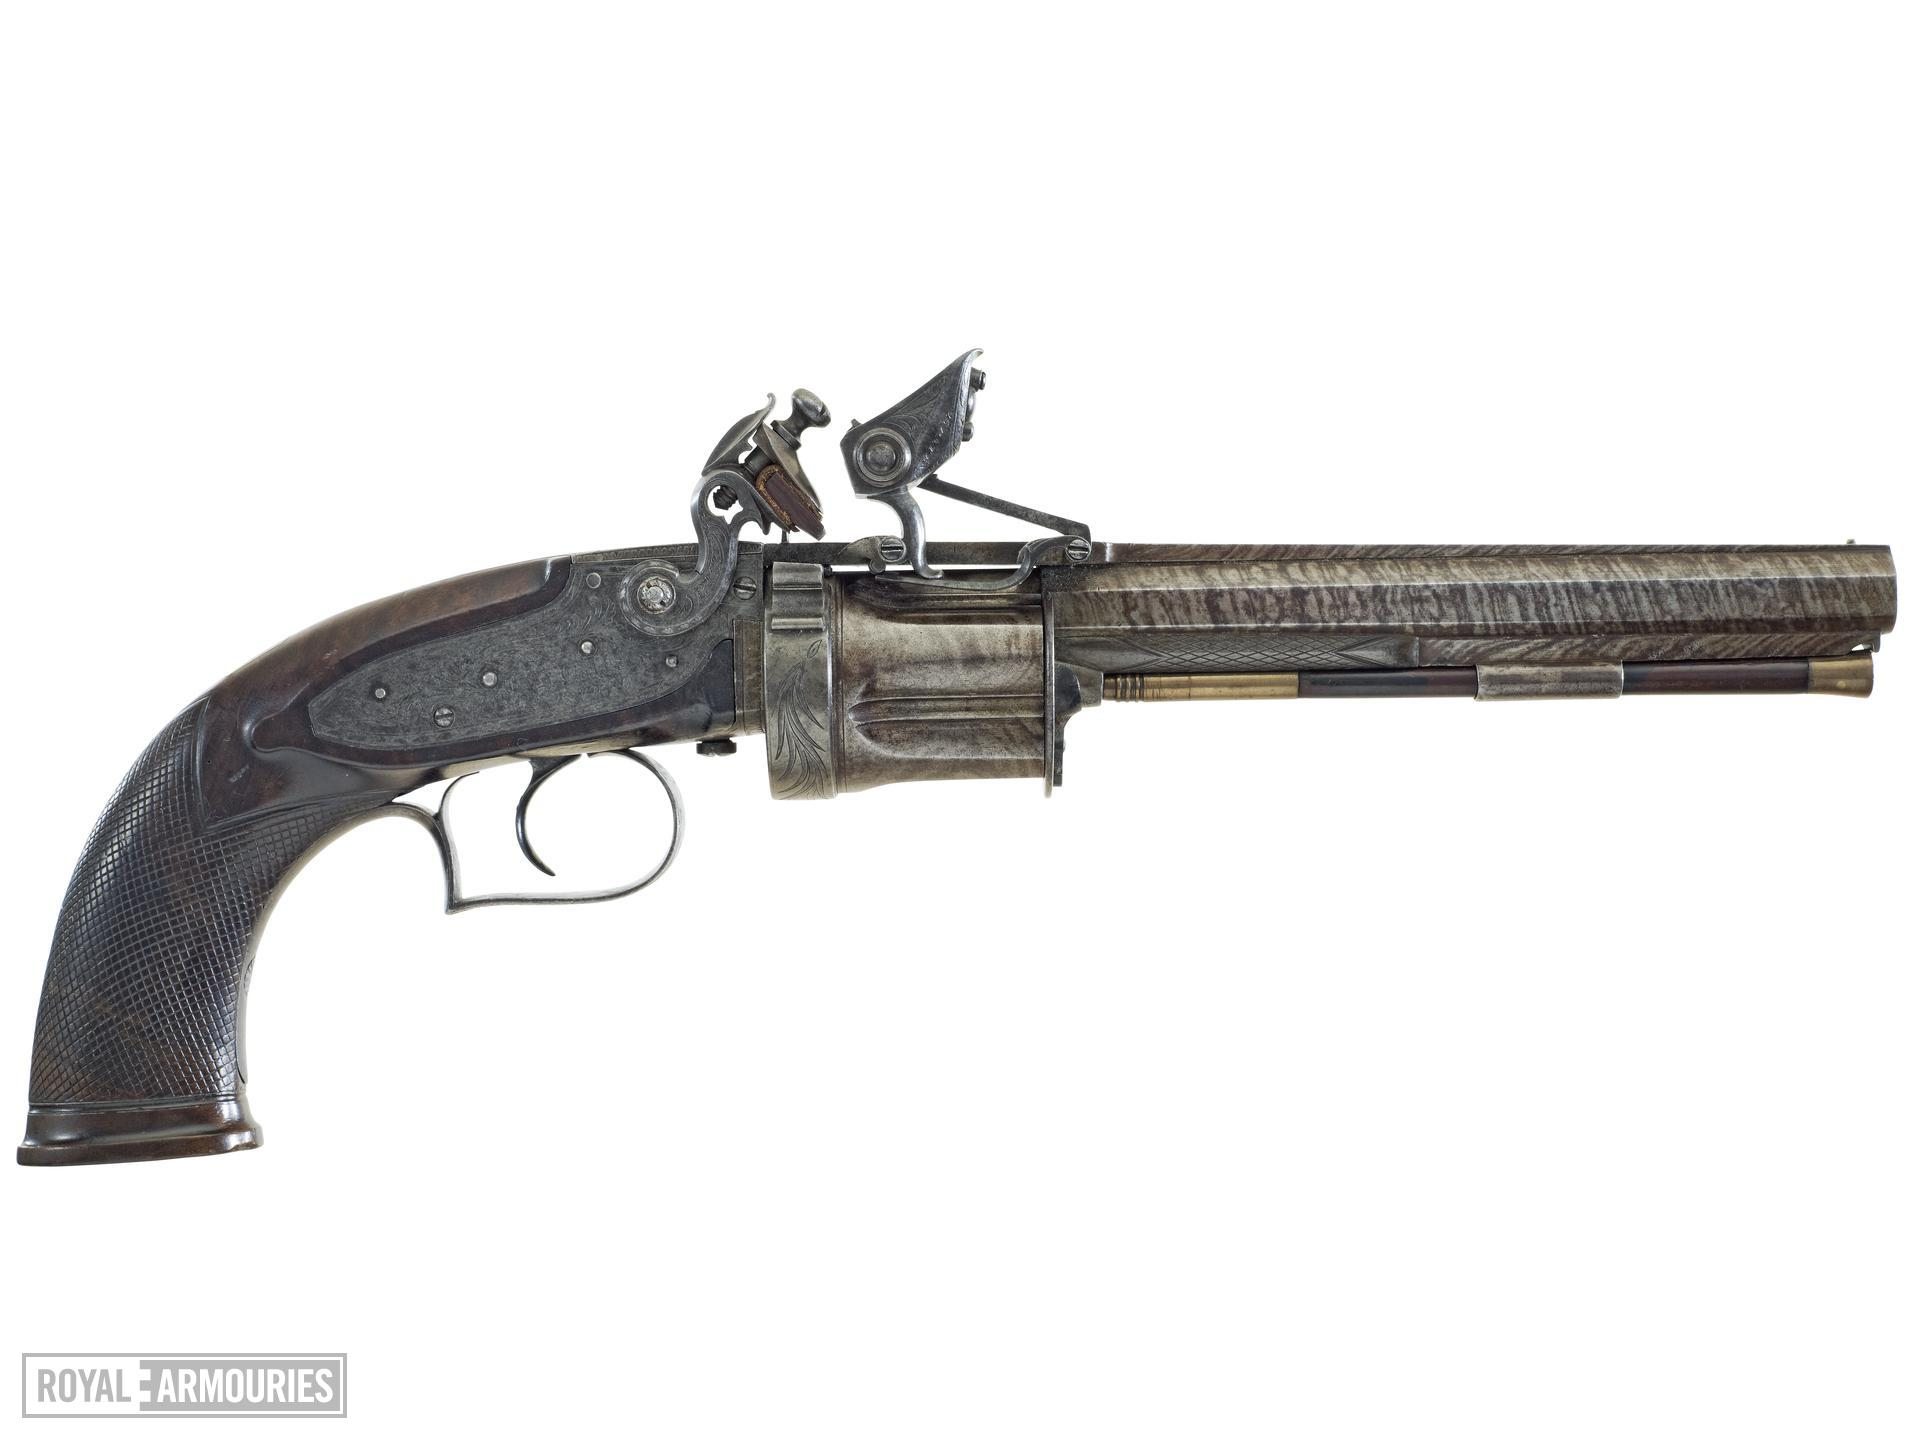 Flintlock six-shot revolver - Collier Patent